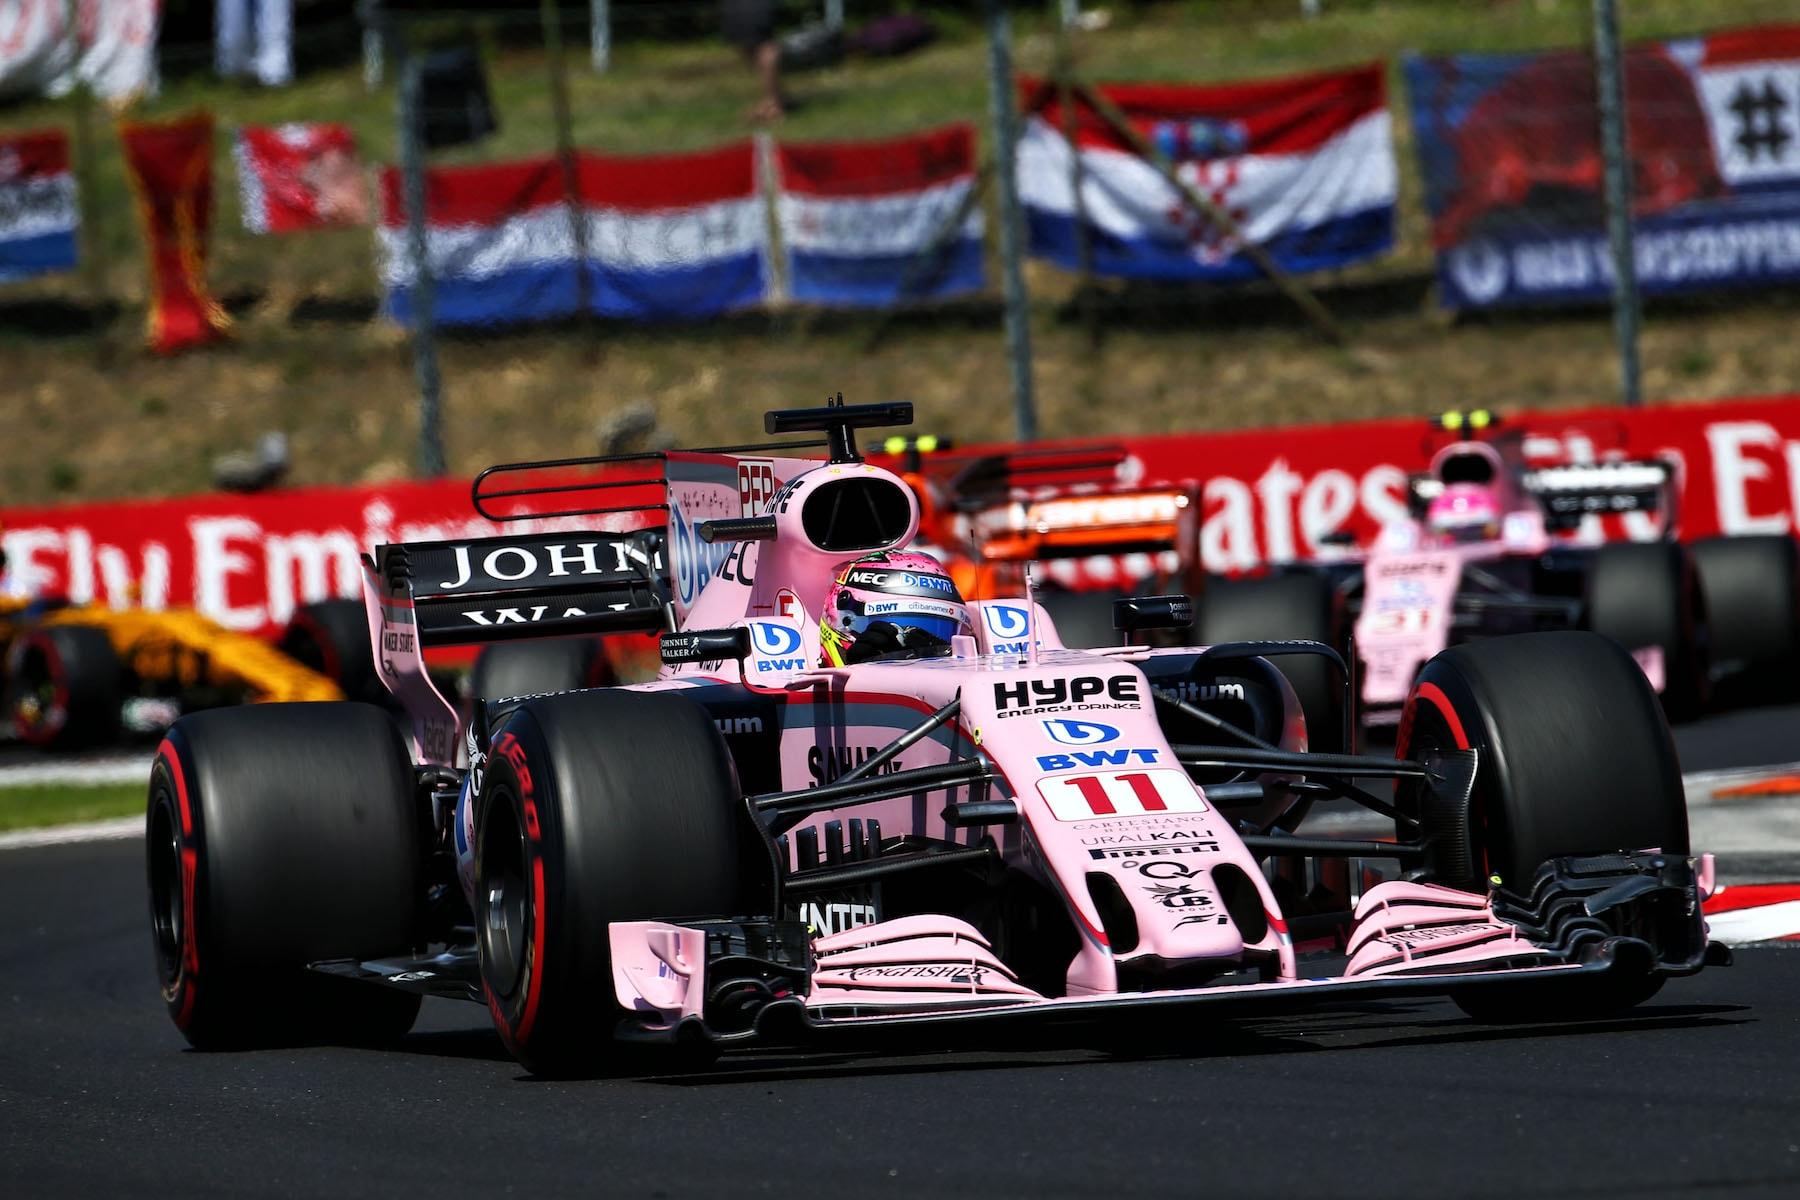 G 2017 Sergio Perez | Force India VJM10 | 2017 Hungarian GP 2 copy.jpg